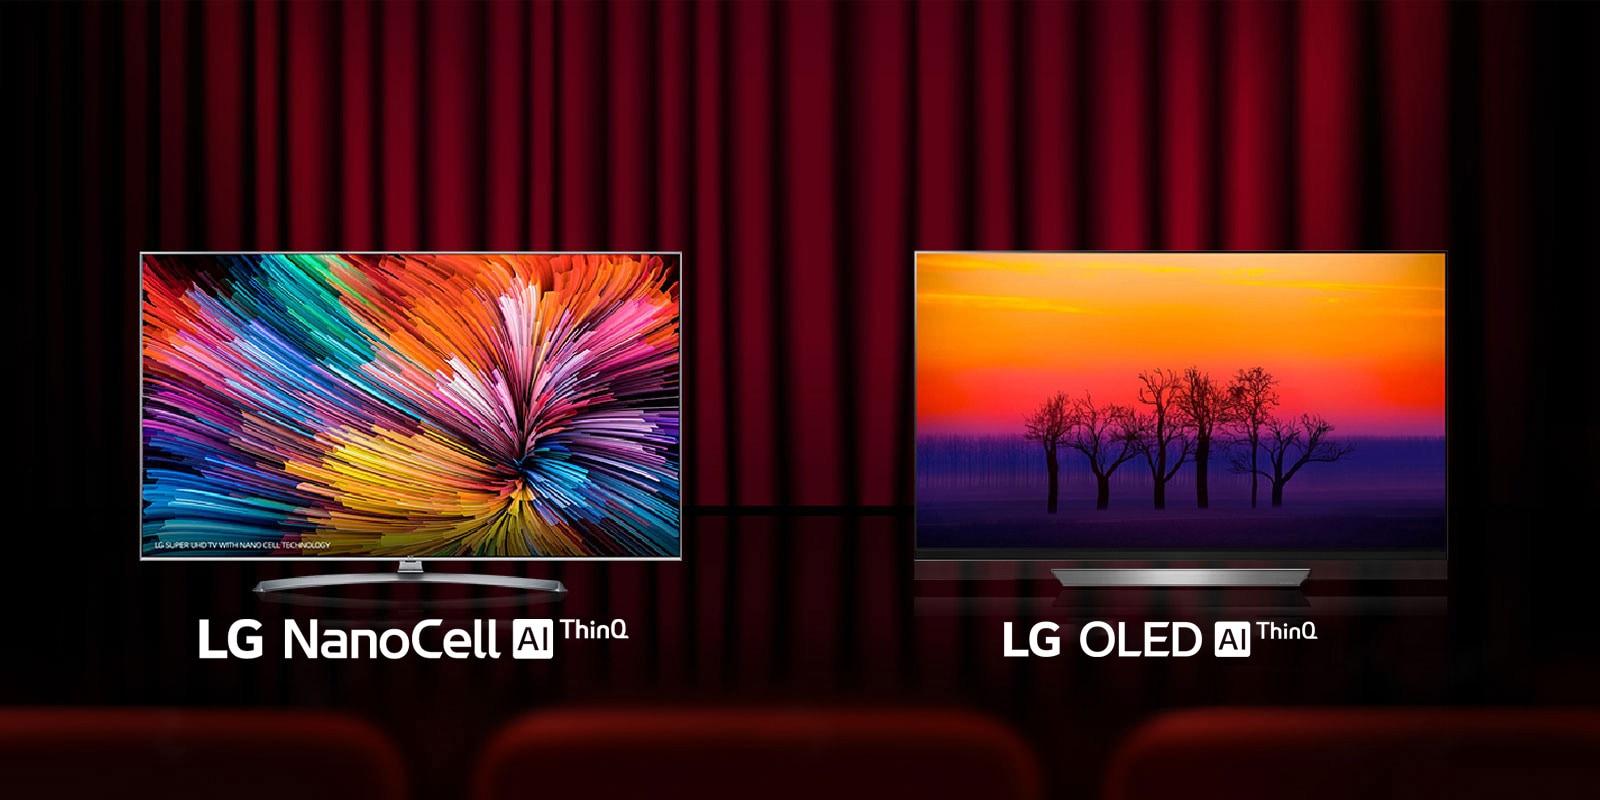 LG: Mobile Devices, TV/AUDIO/VIDEO & Appliances | LG Saudi Arabia